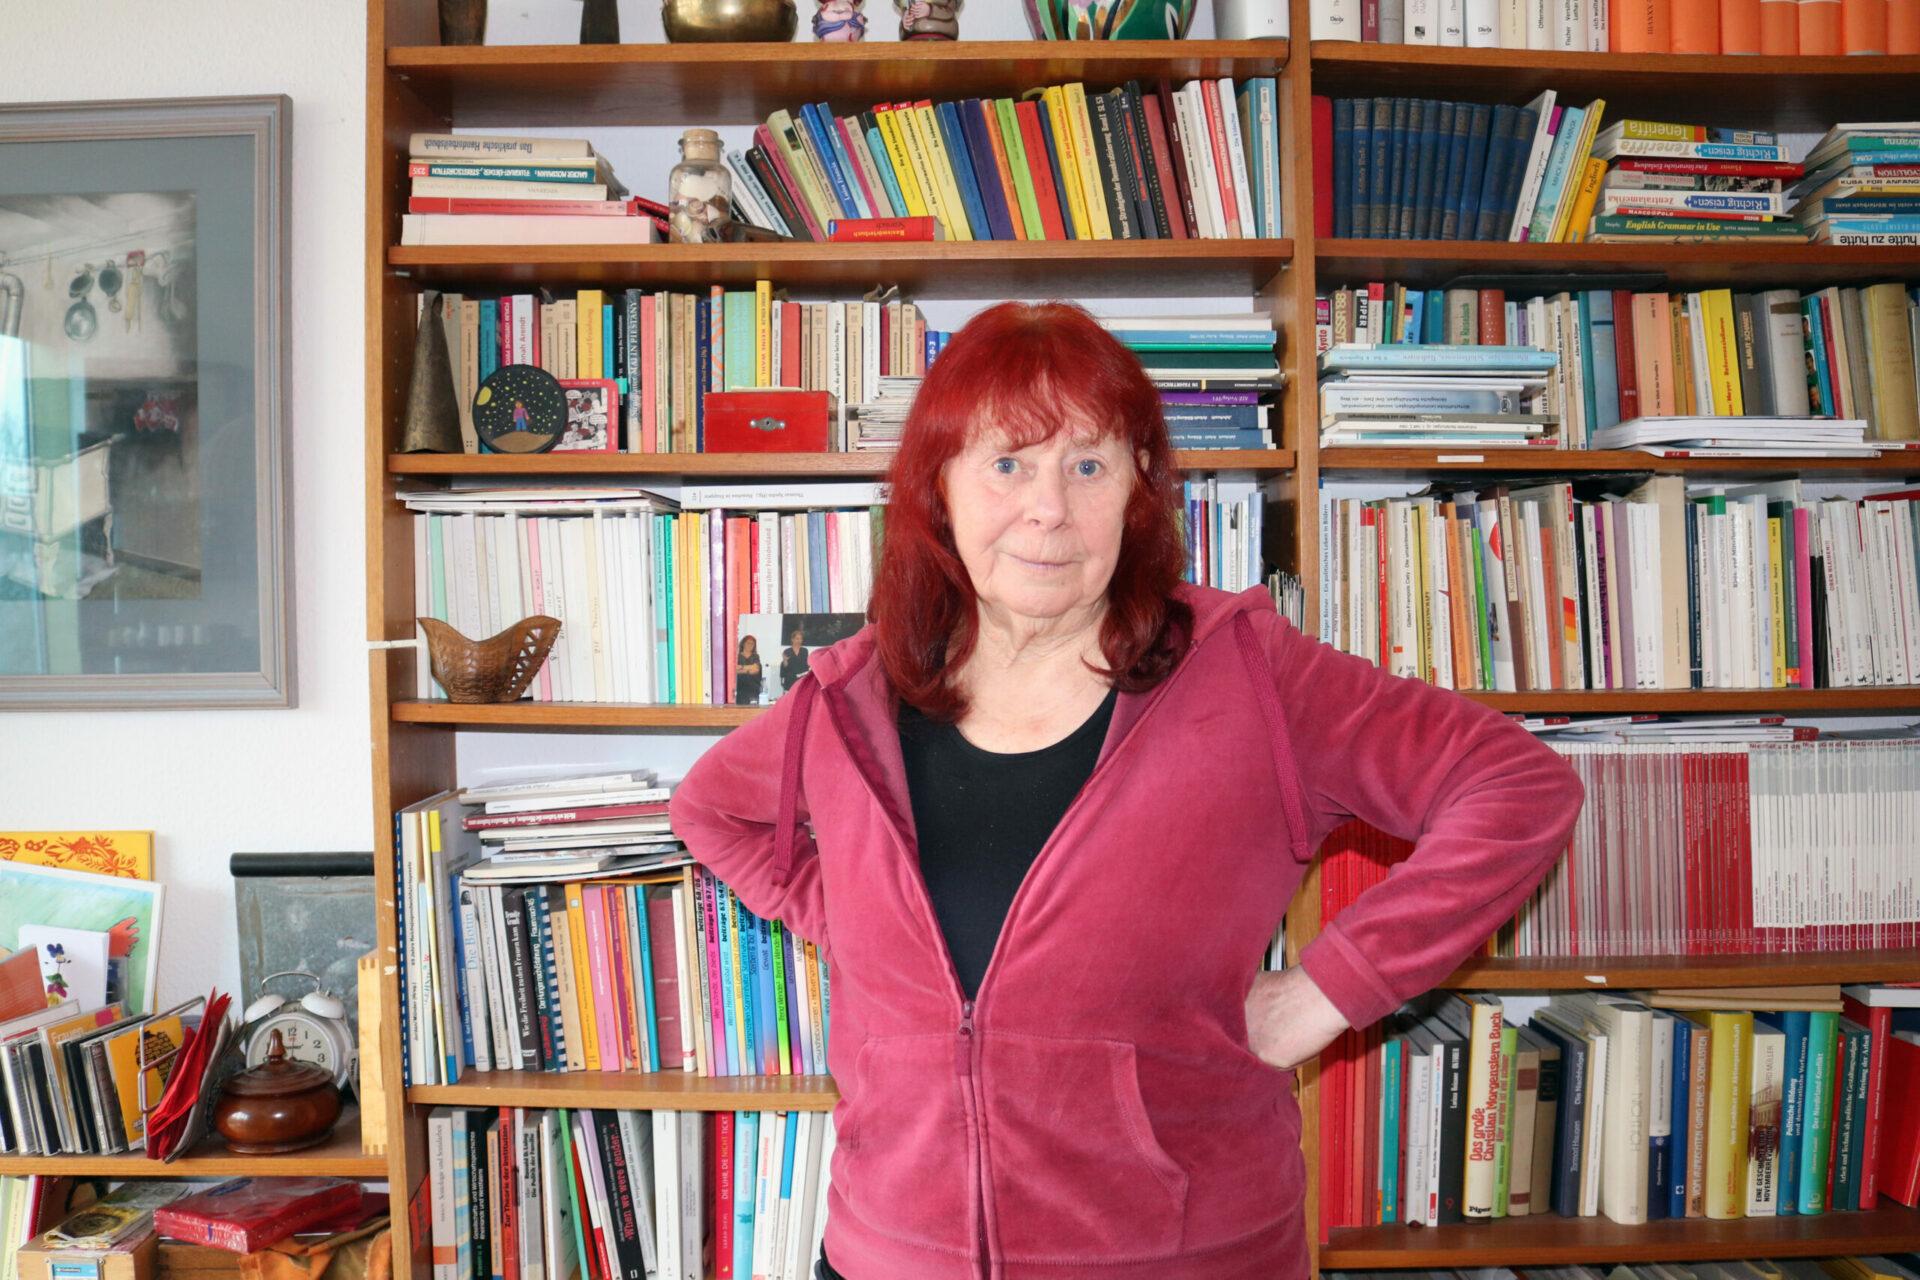 Gisela Notz